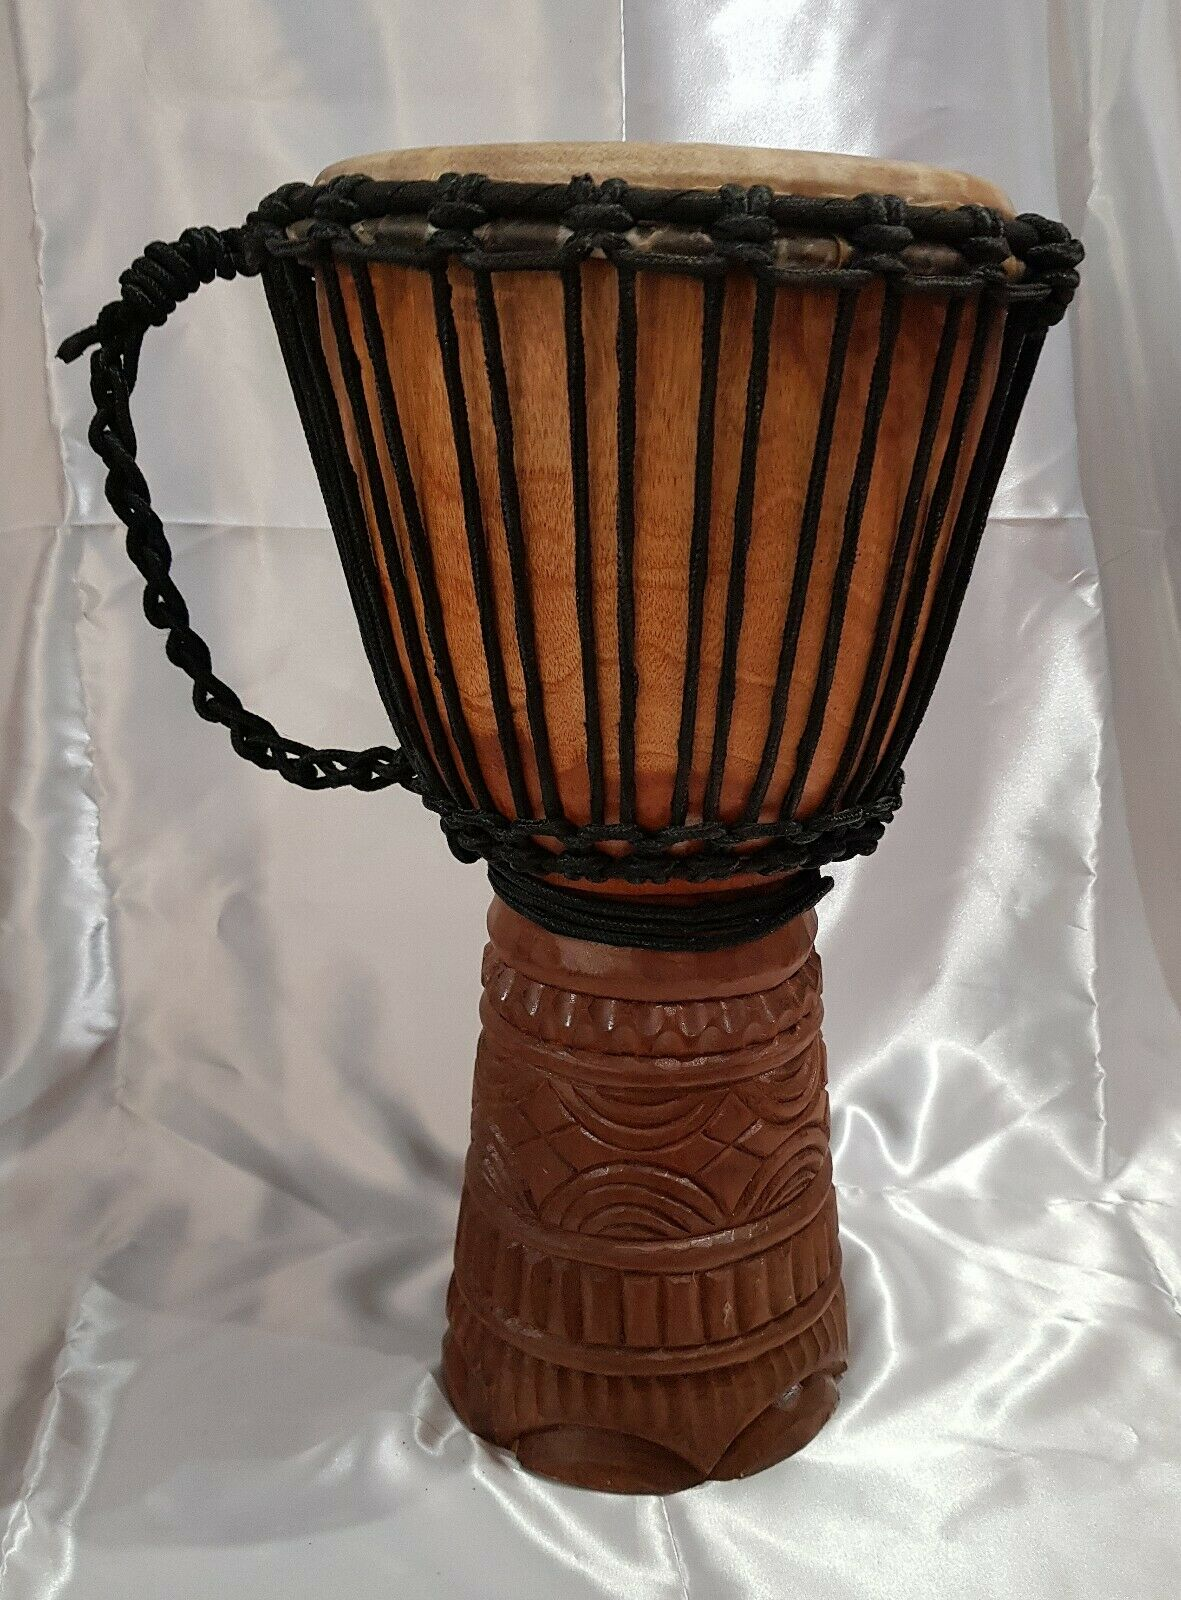 Djembe Trommel Handtrommel Bongo Drum Ziegenleder H 50 cm  D 24 cm Afrika Neu